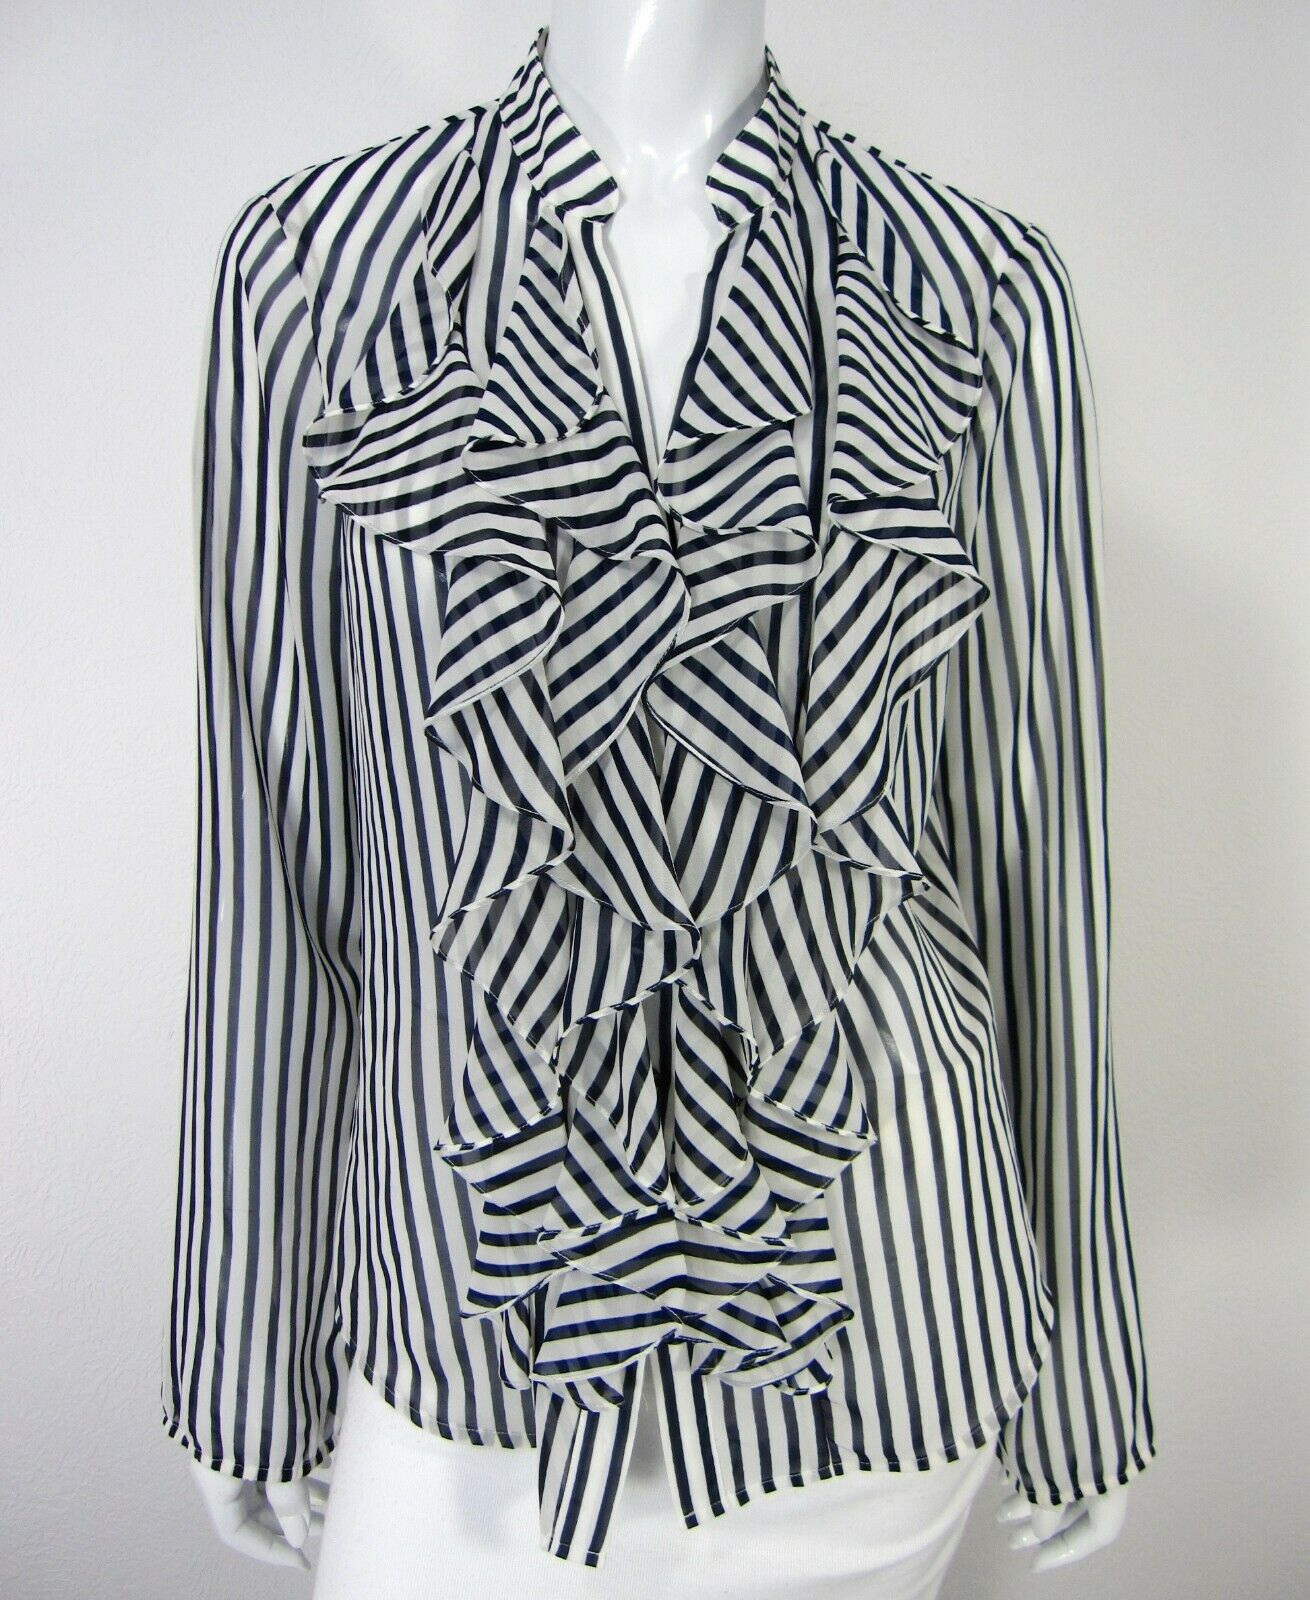 Cache NWT Long Sleeve TOP Blouse 10 Blau Weiß Striped Ruffled Neckline